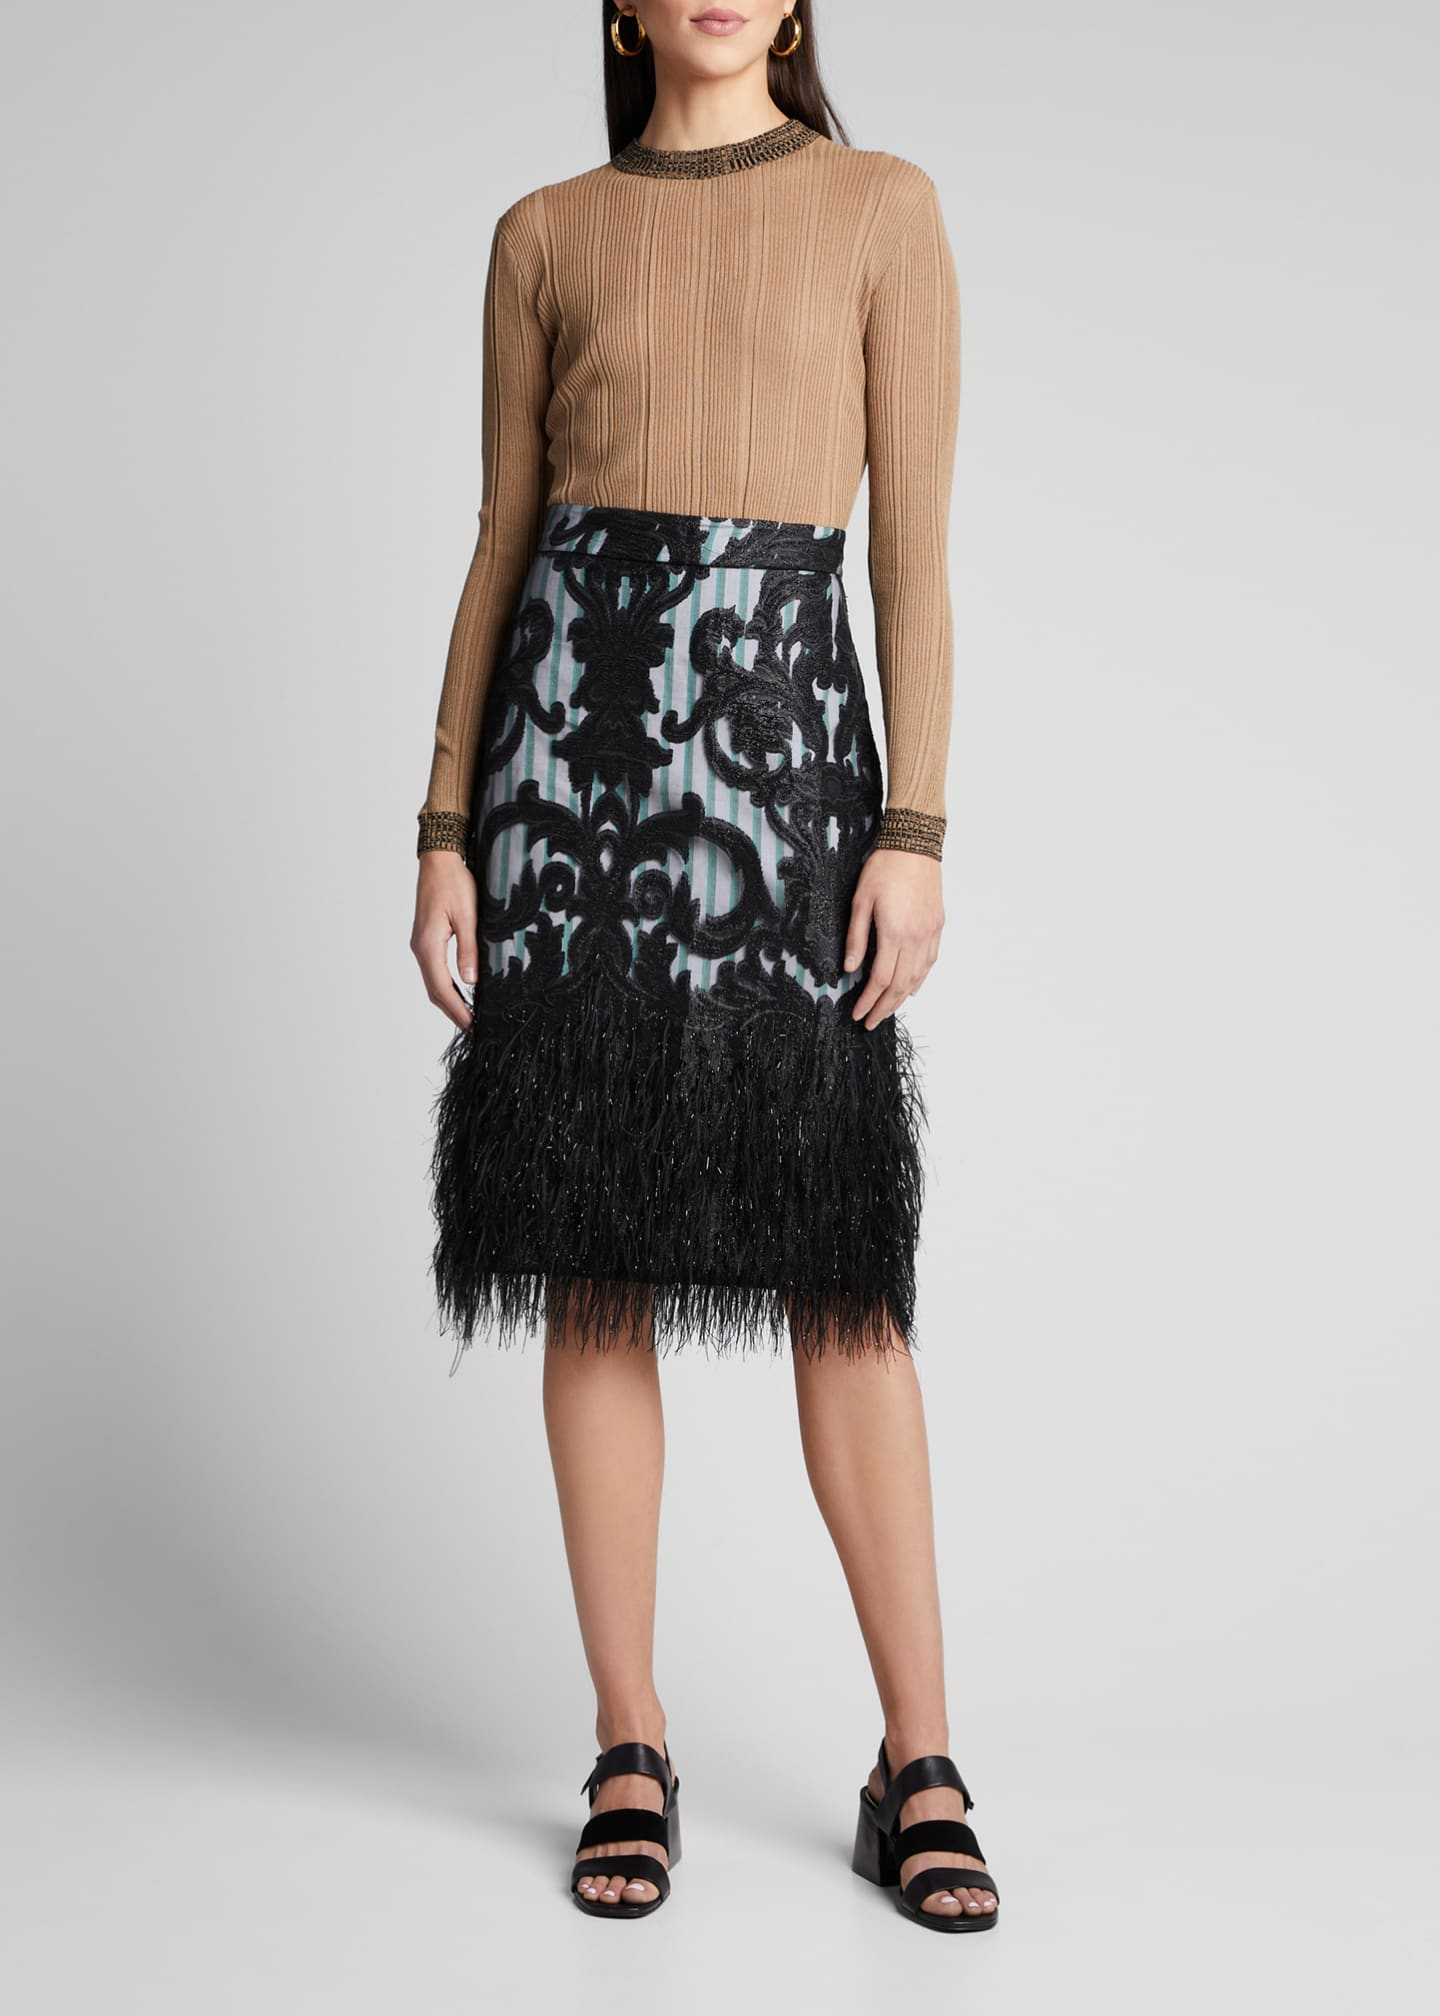 Ganni High-Rise Poplin Skirt with Feathery Mesh Overlay